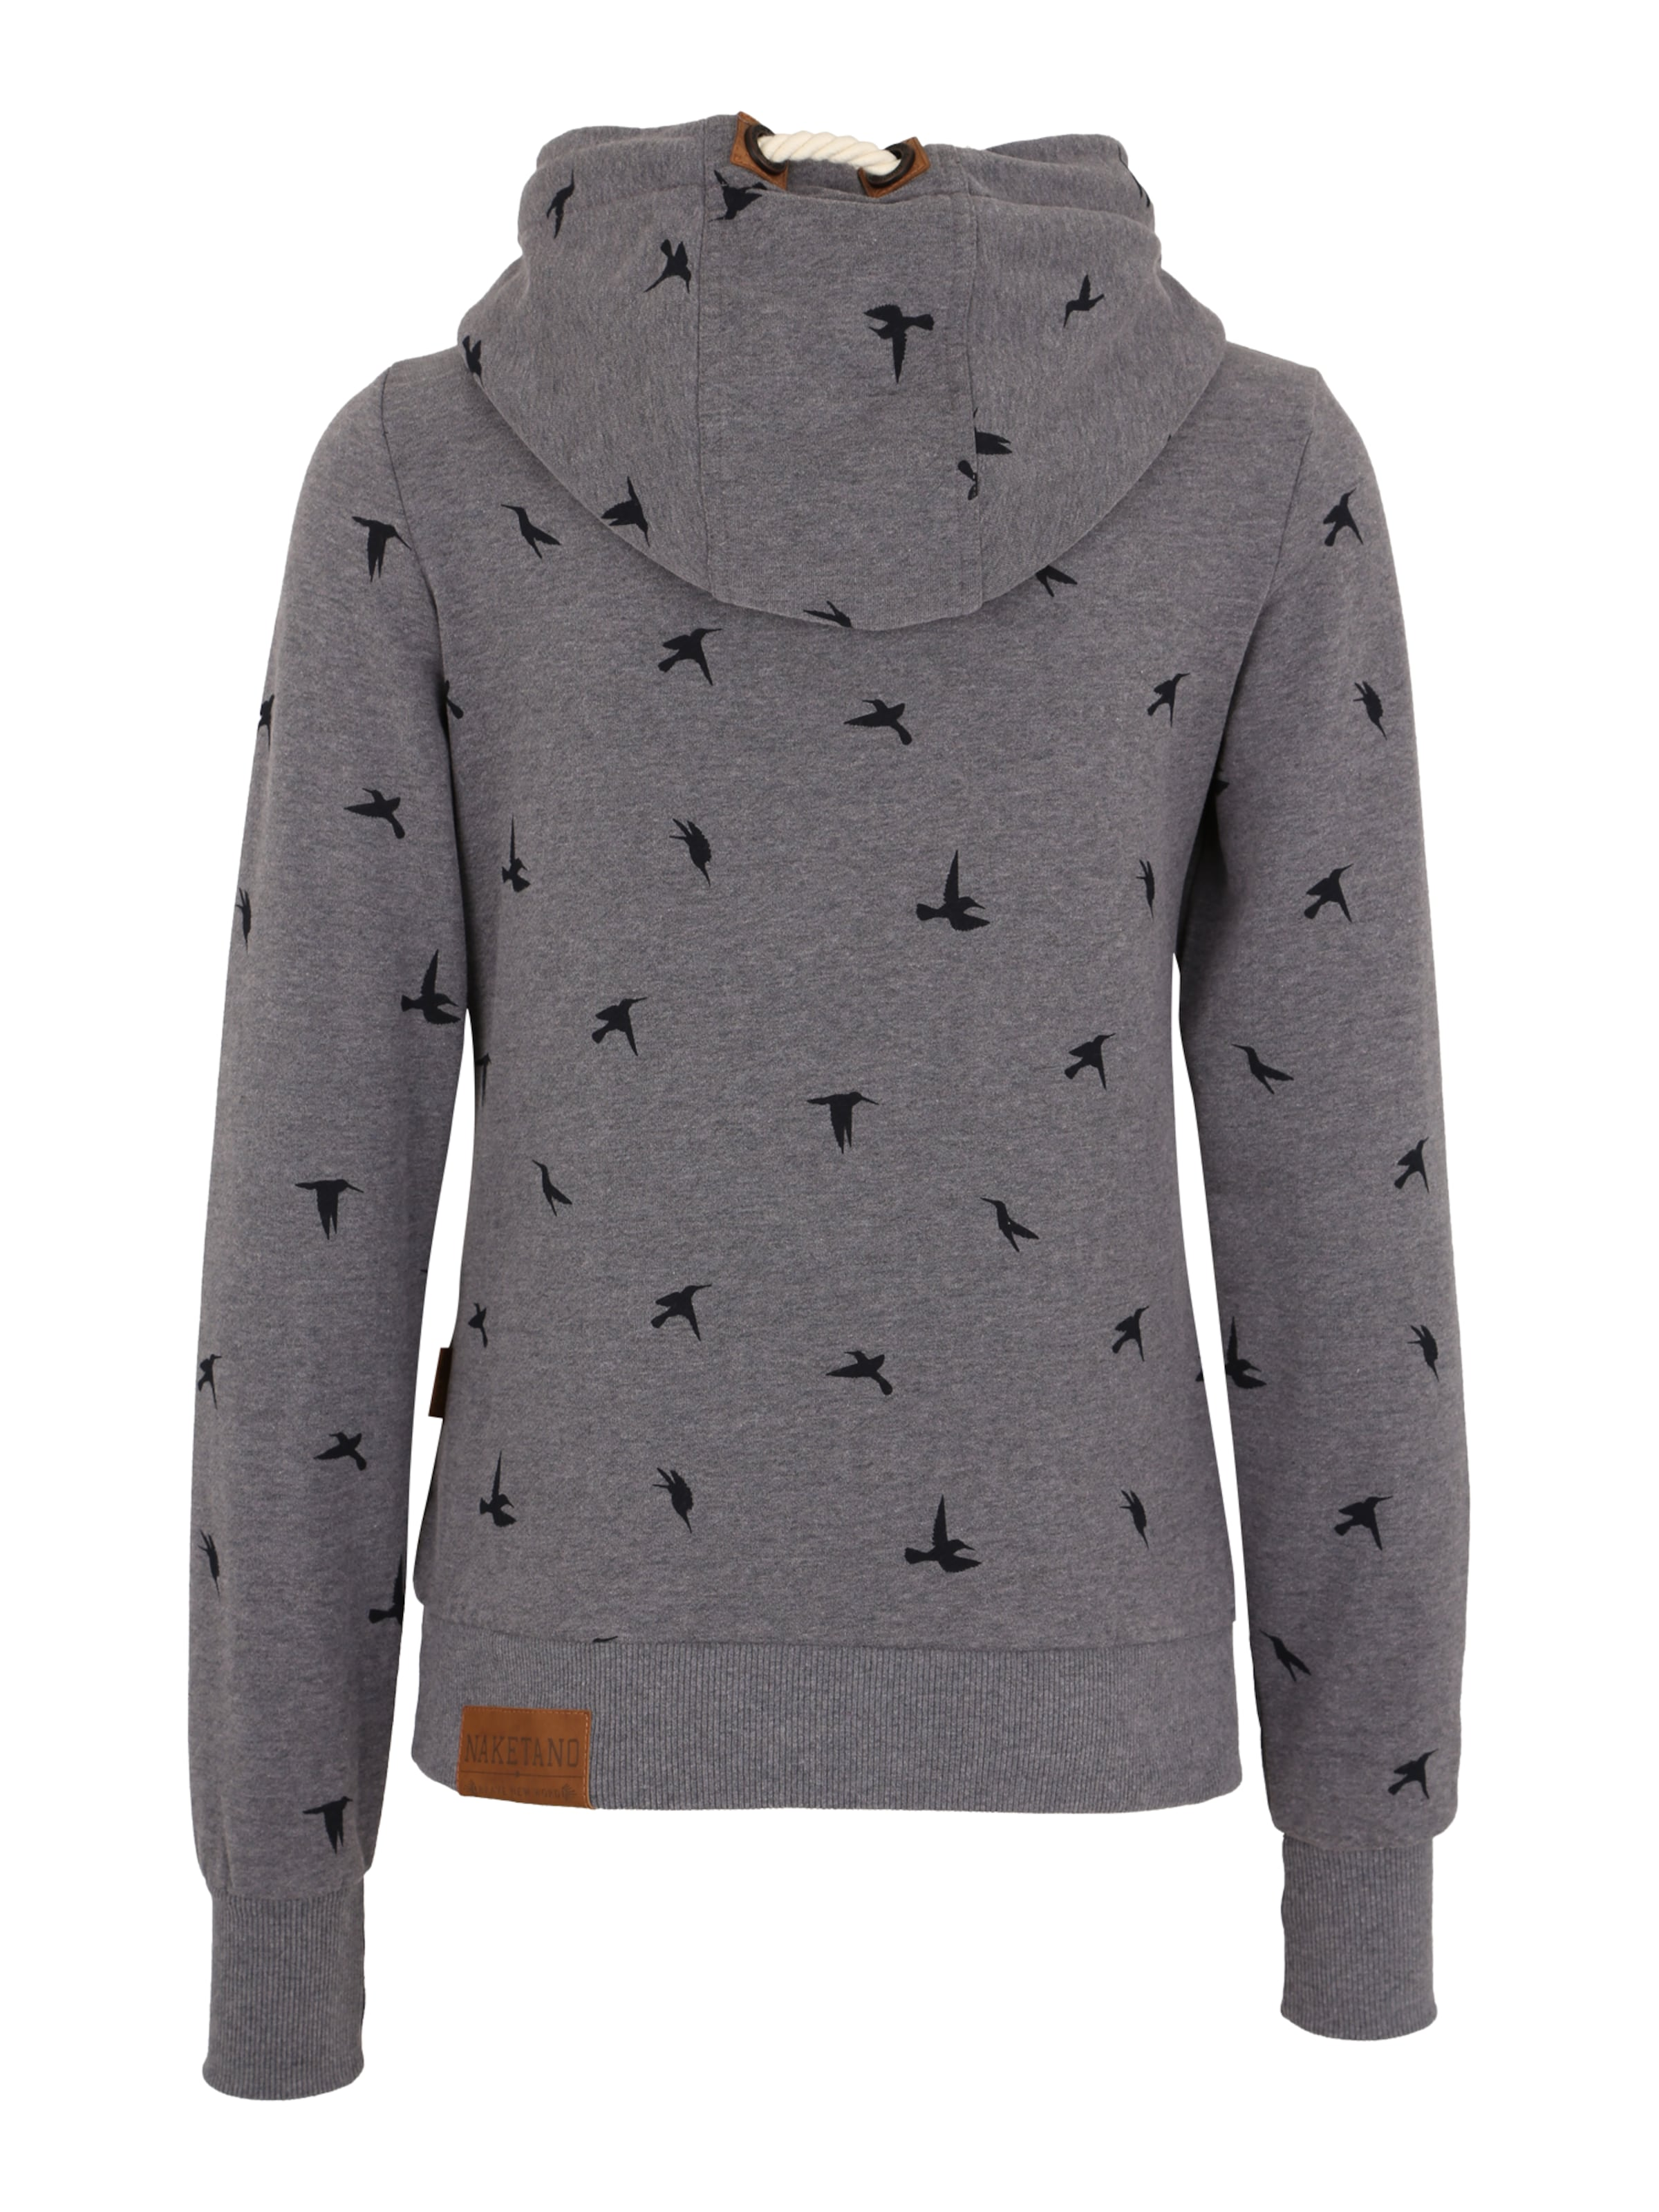 The Gap' Naketano Marron shirt NuitBleu For gris En Sweat Bleu 'go 8Ok0Pwn